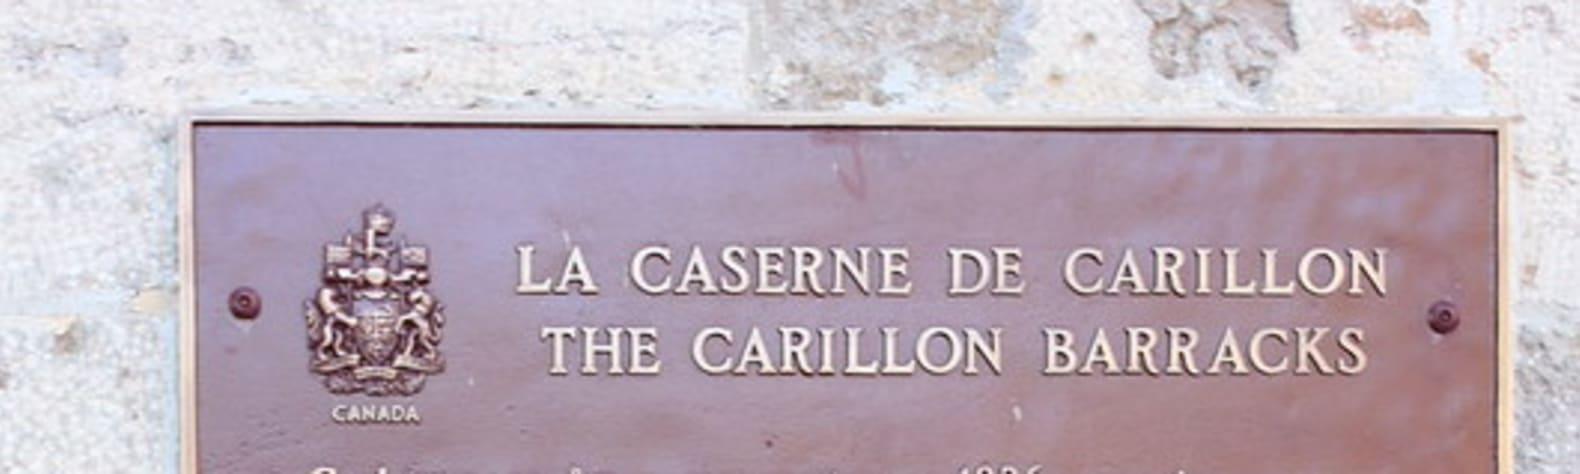 Carillon Barracks National Historic Site